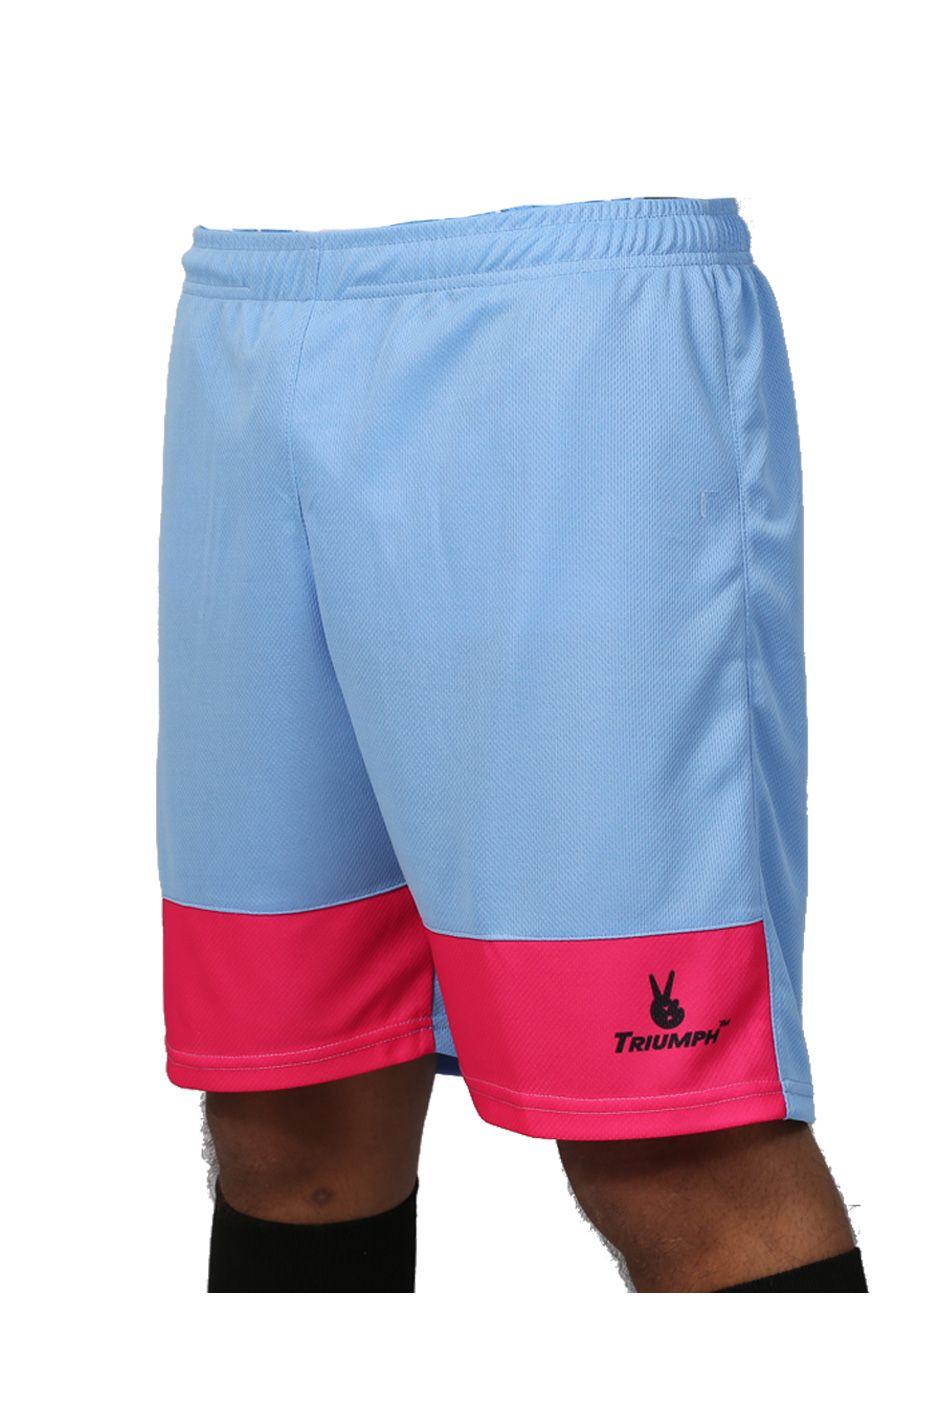 Adidas Hockey Torwart Trikot Set Shorts Shirt